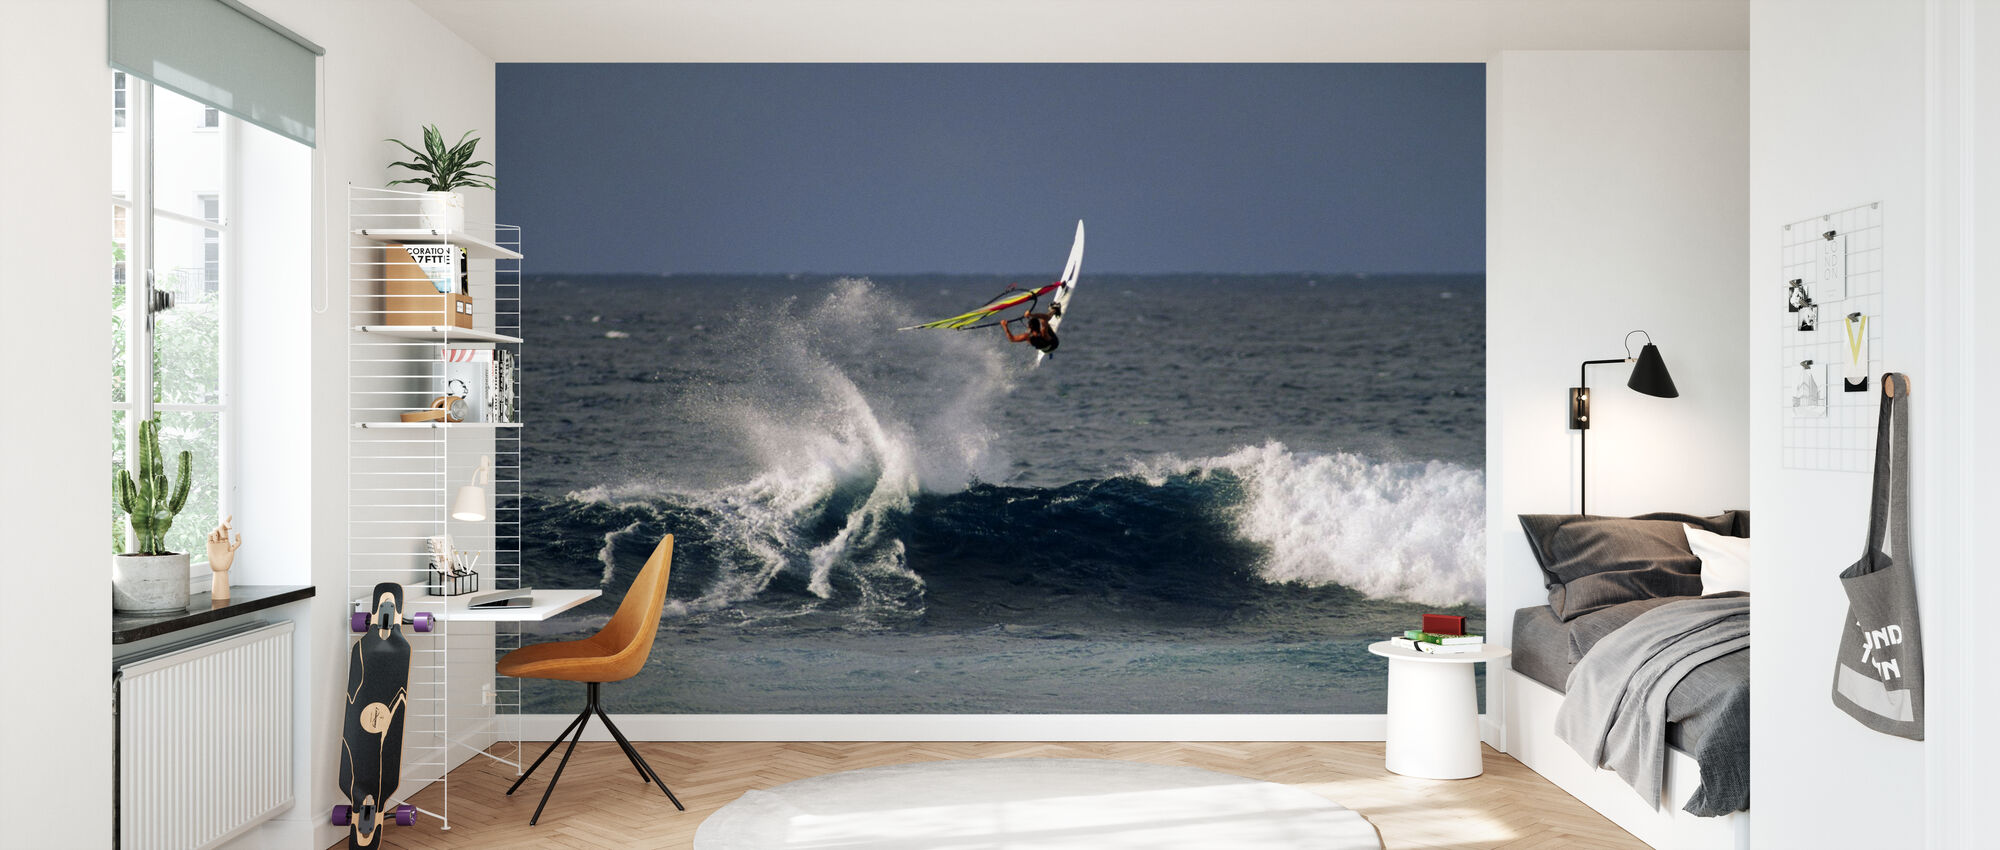 Windsurfer at Hookipa Beach Park - Wallpaper - Kids Room